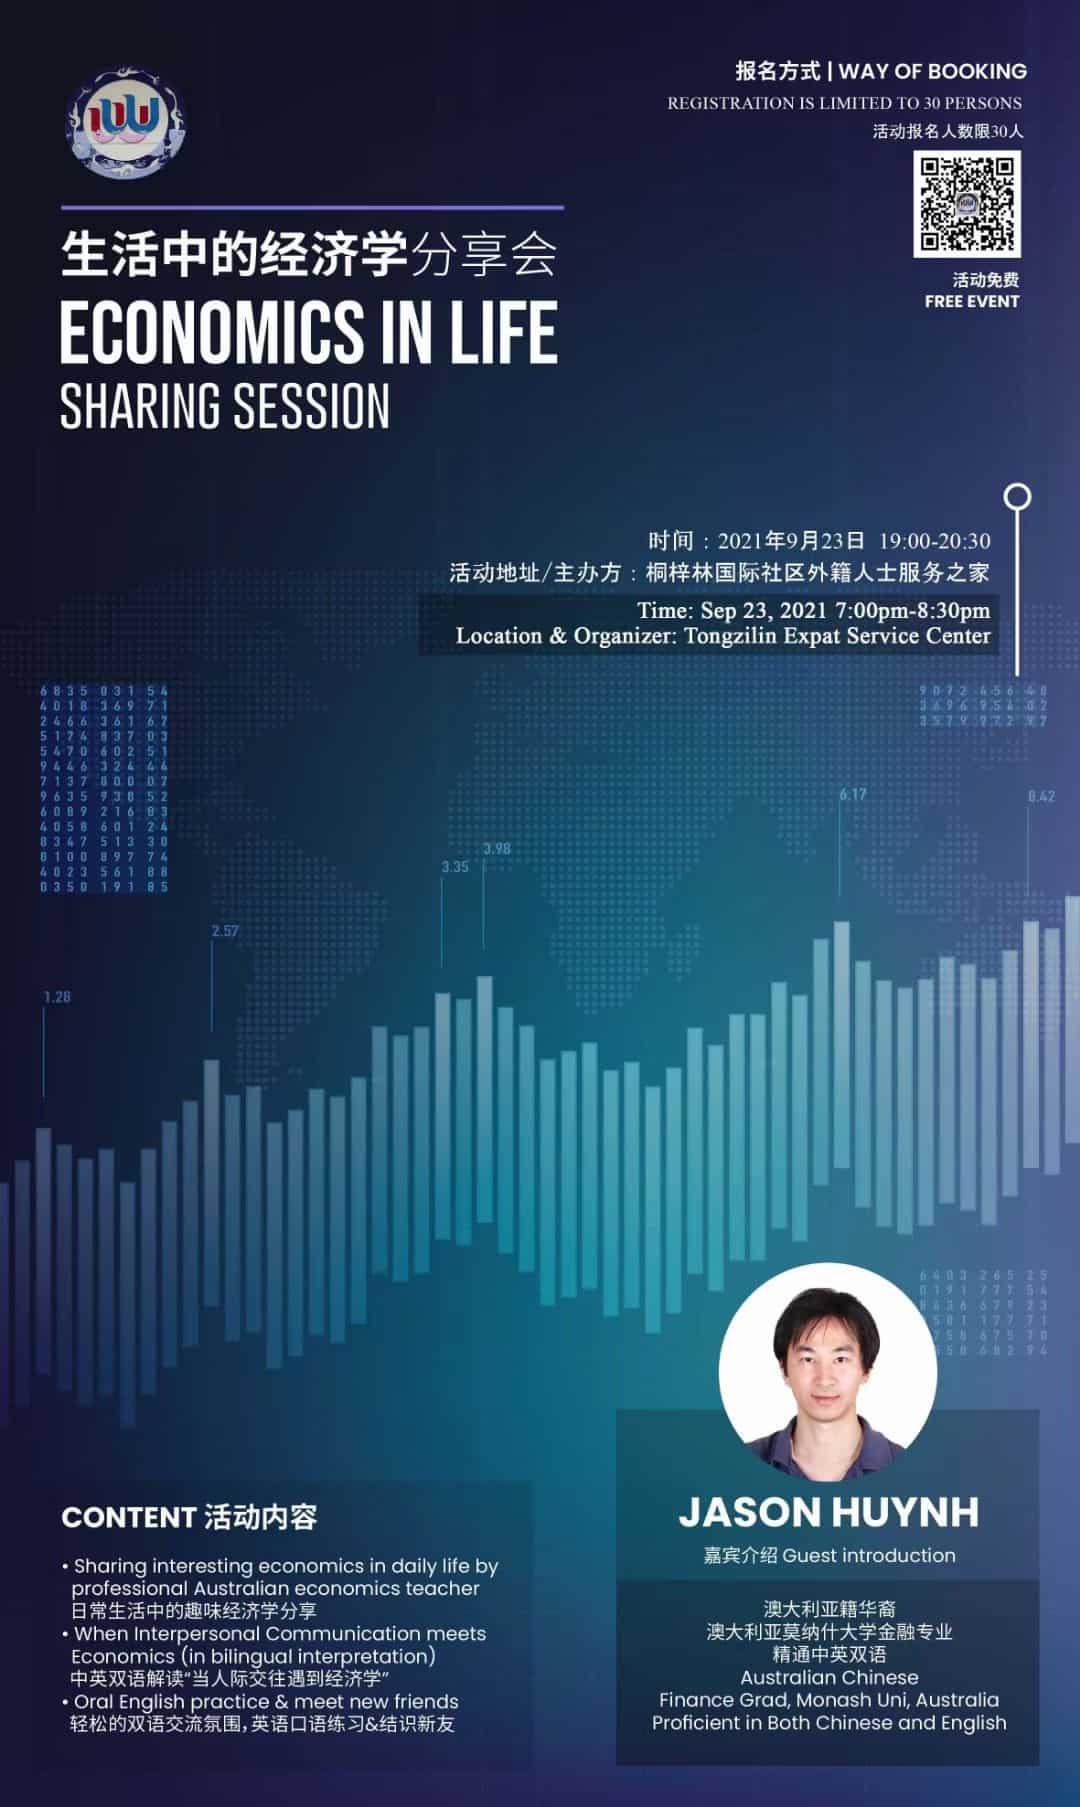 Economics life investment session chengdu expat